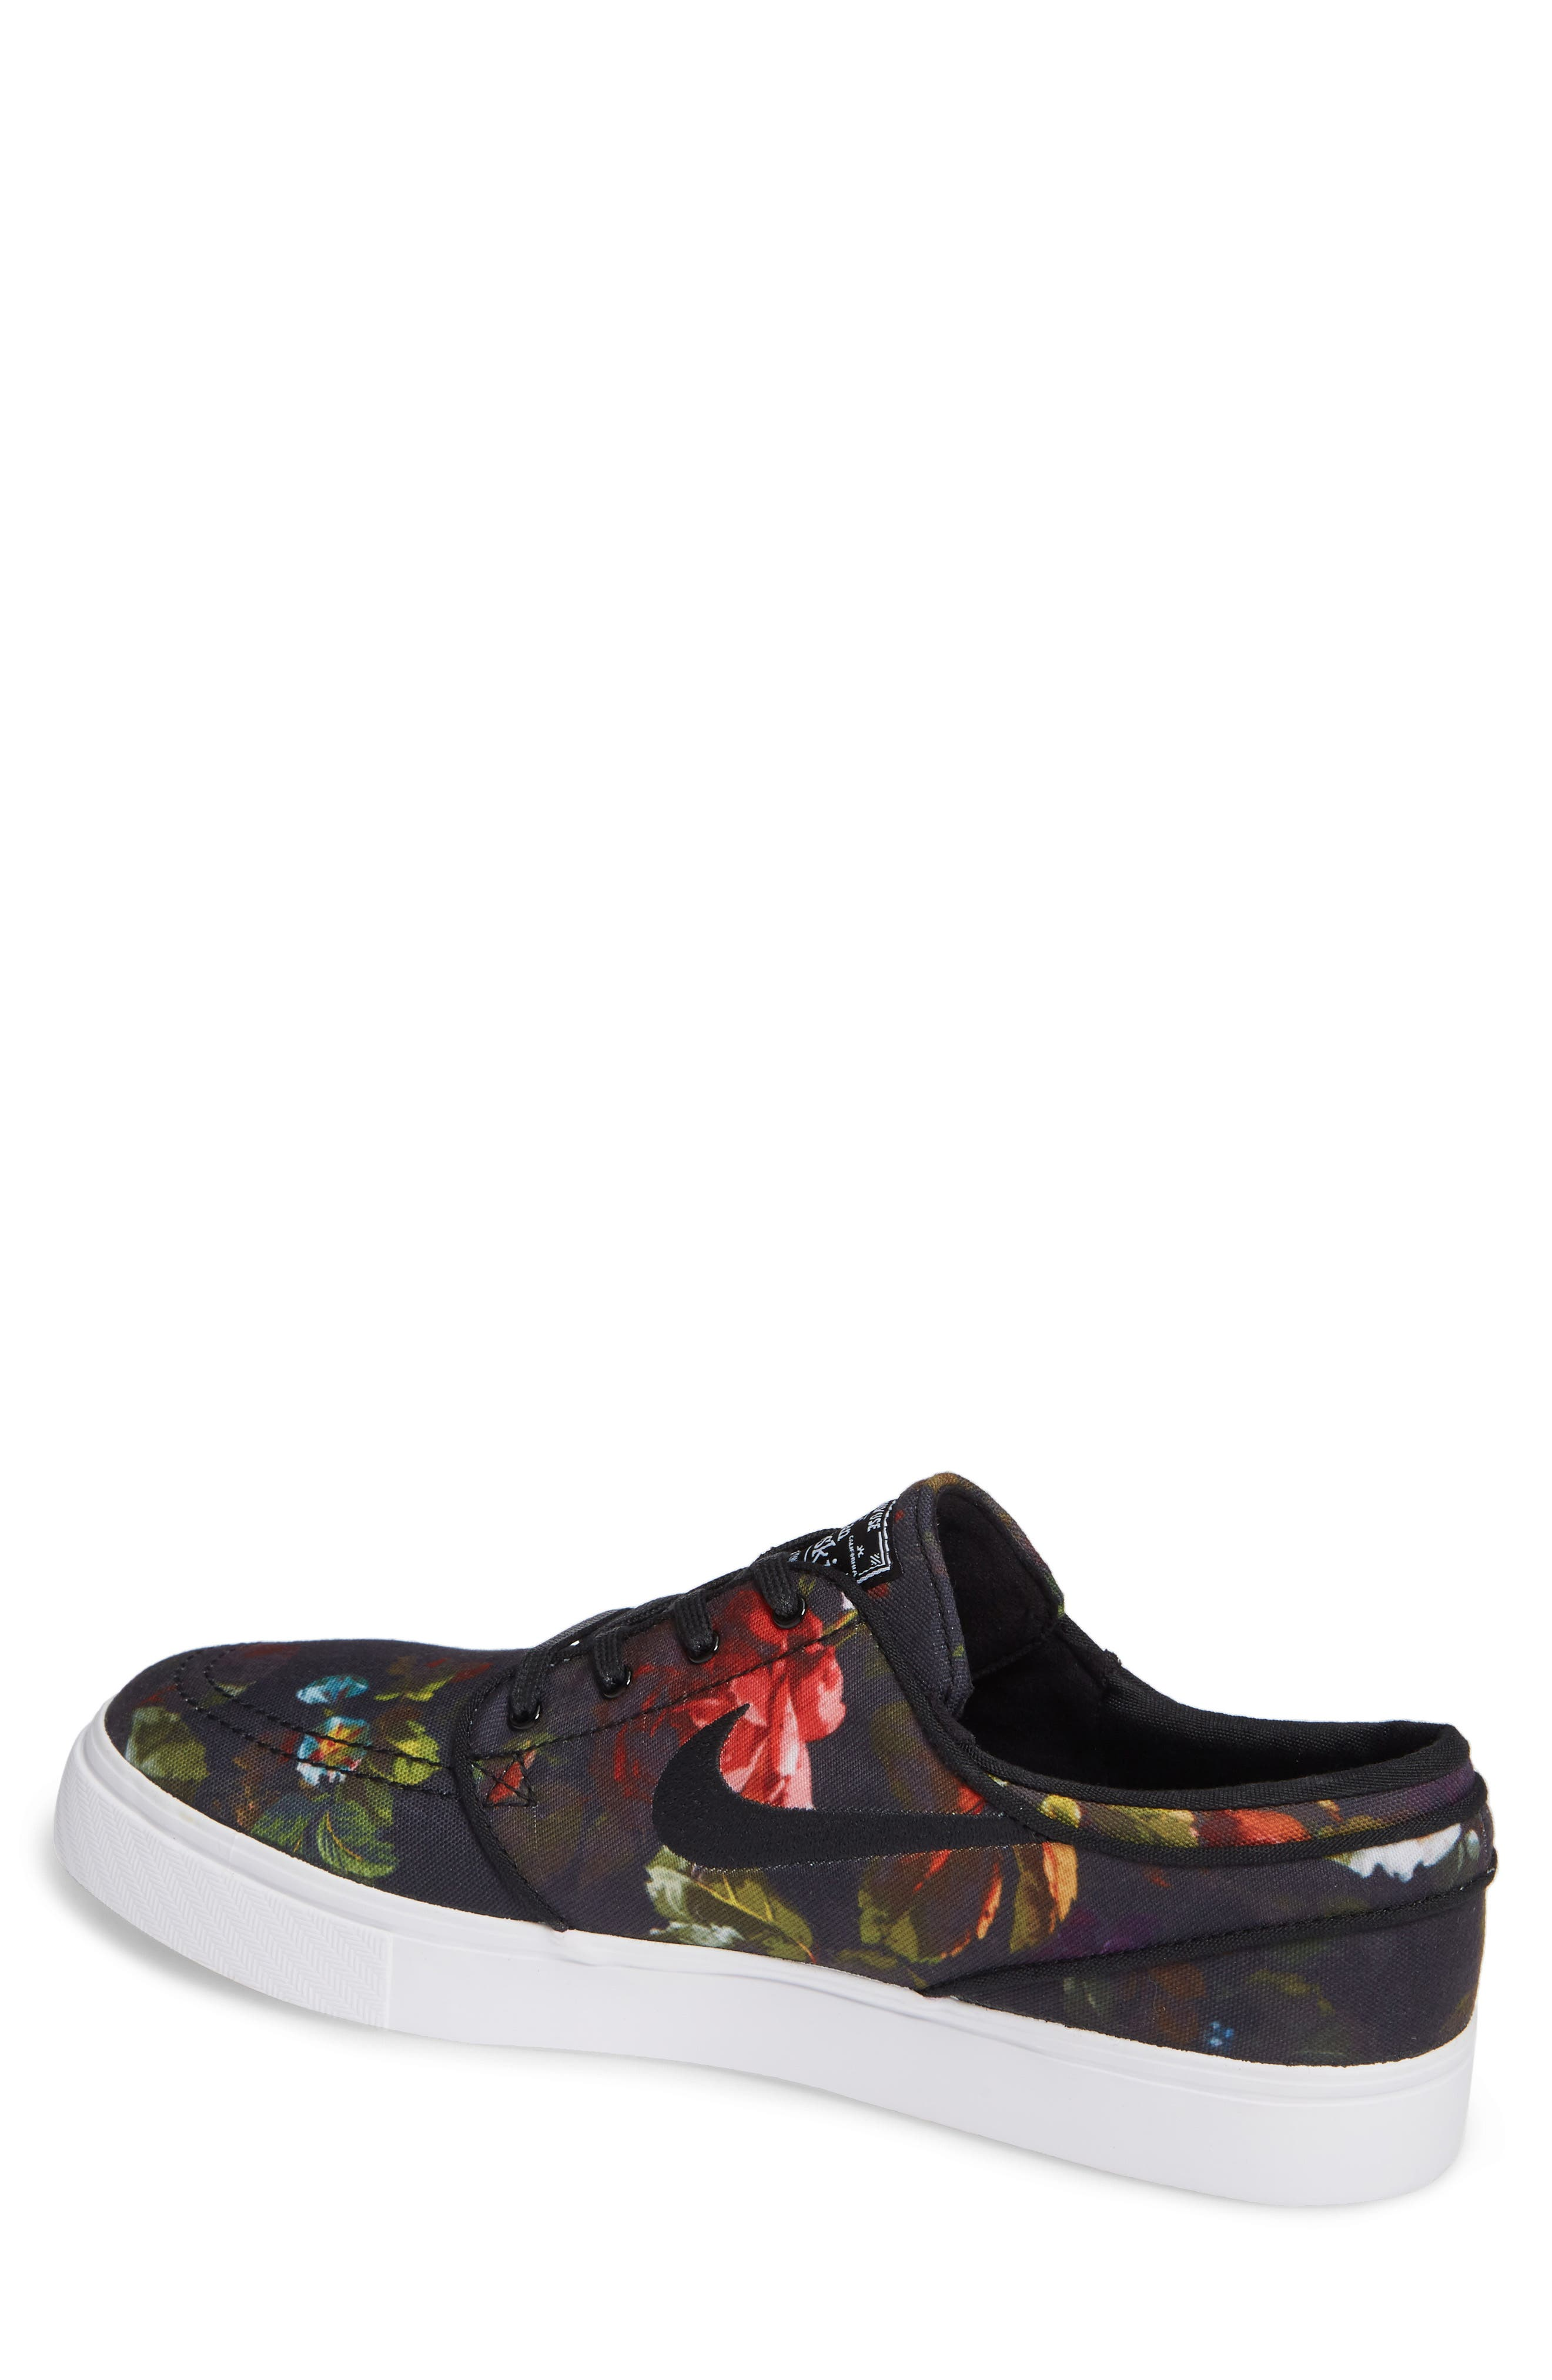 Zoom - Stefan Janoski SB Canvas Skate Shoe,                             Alternate thumbnail 45, color,